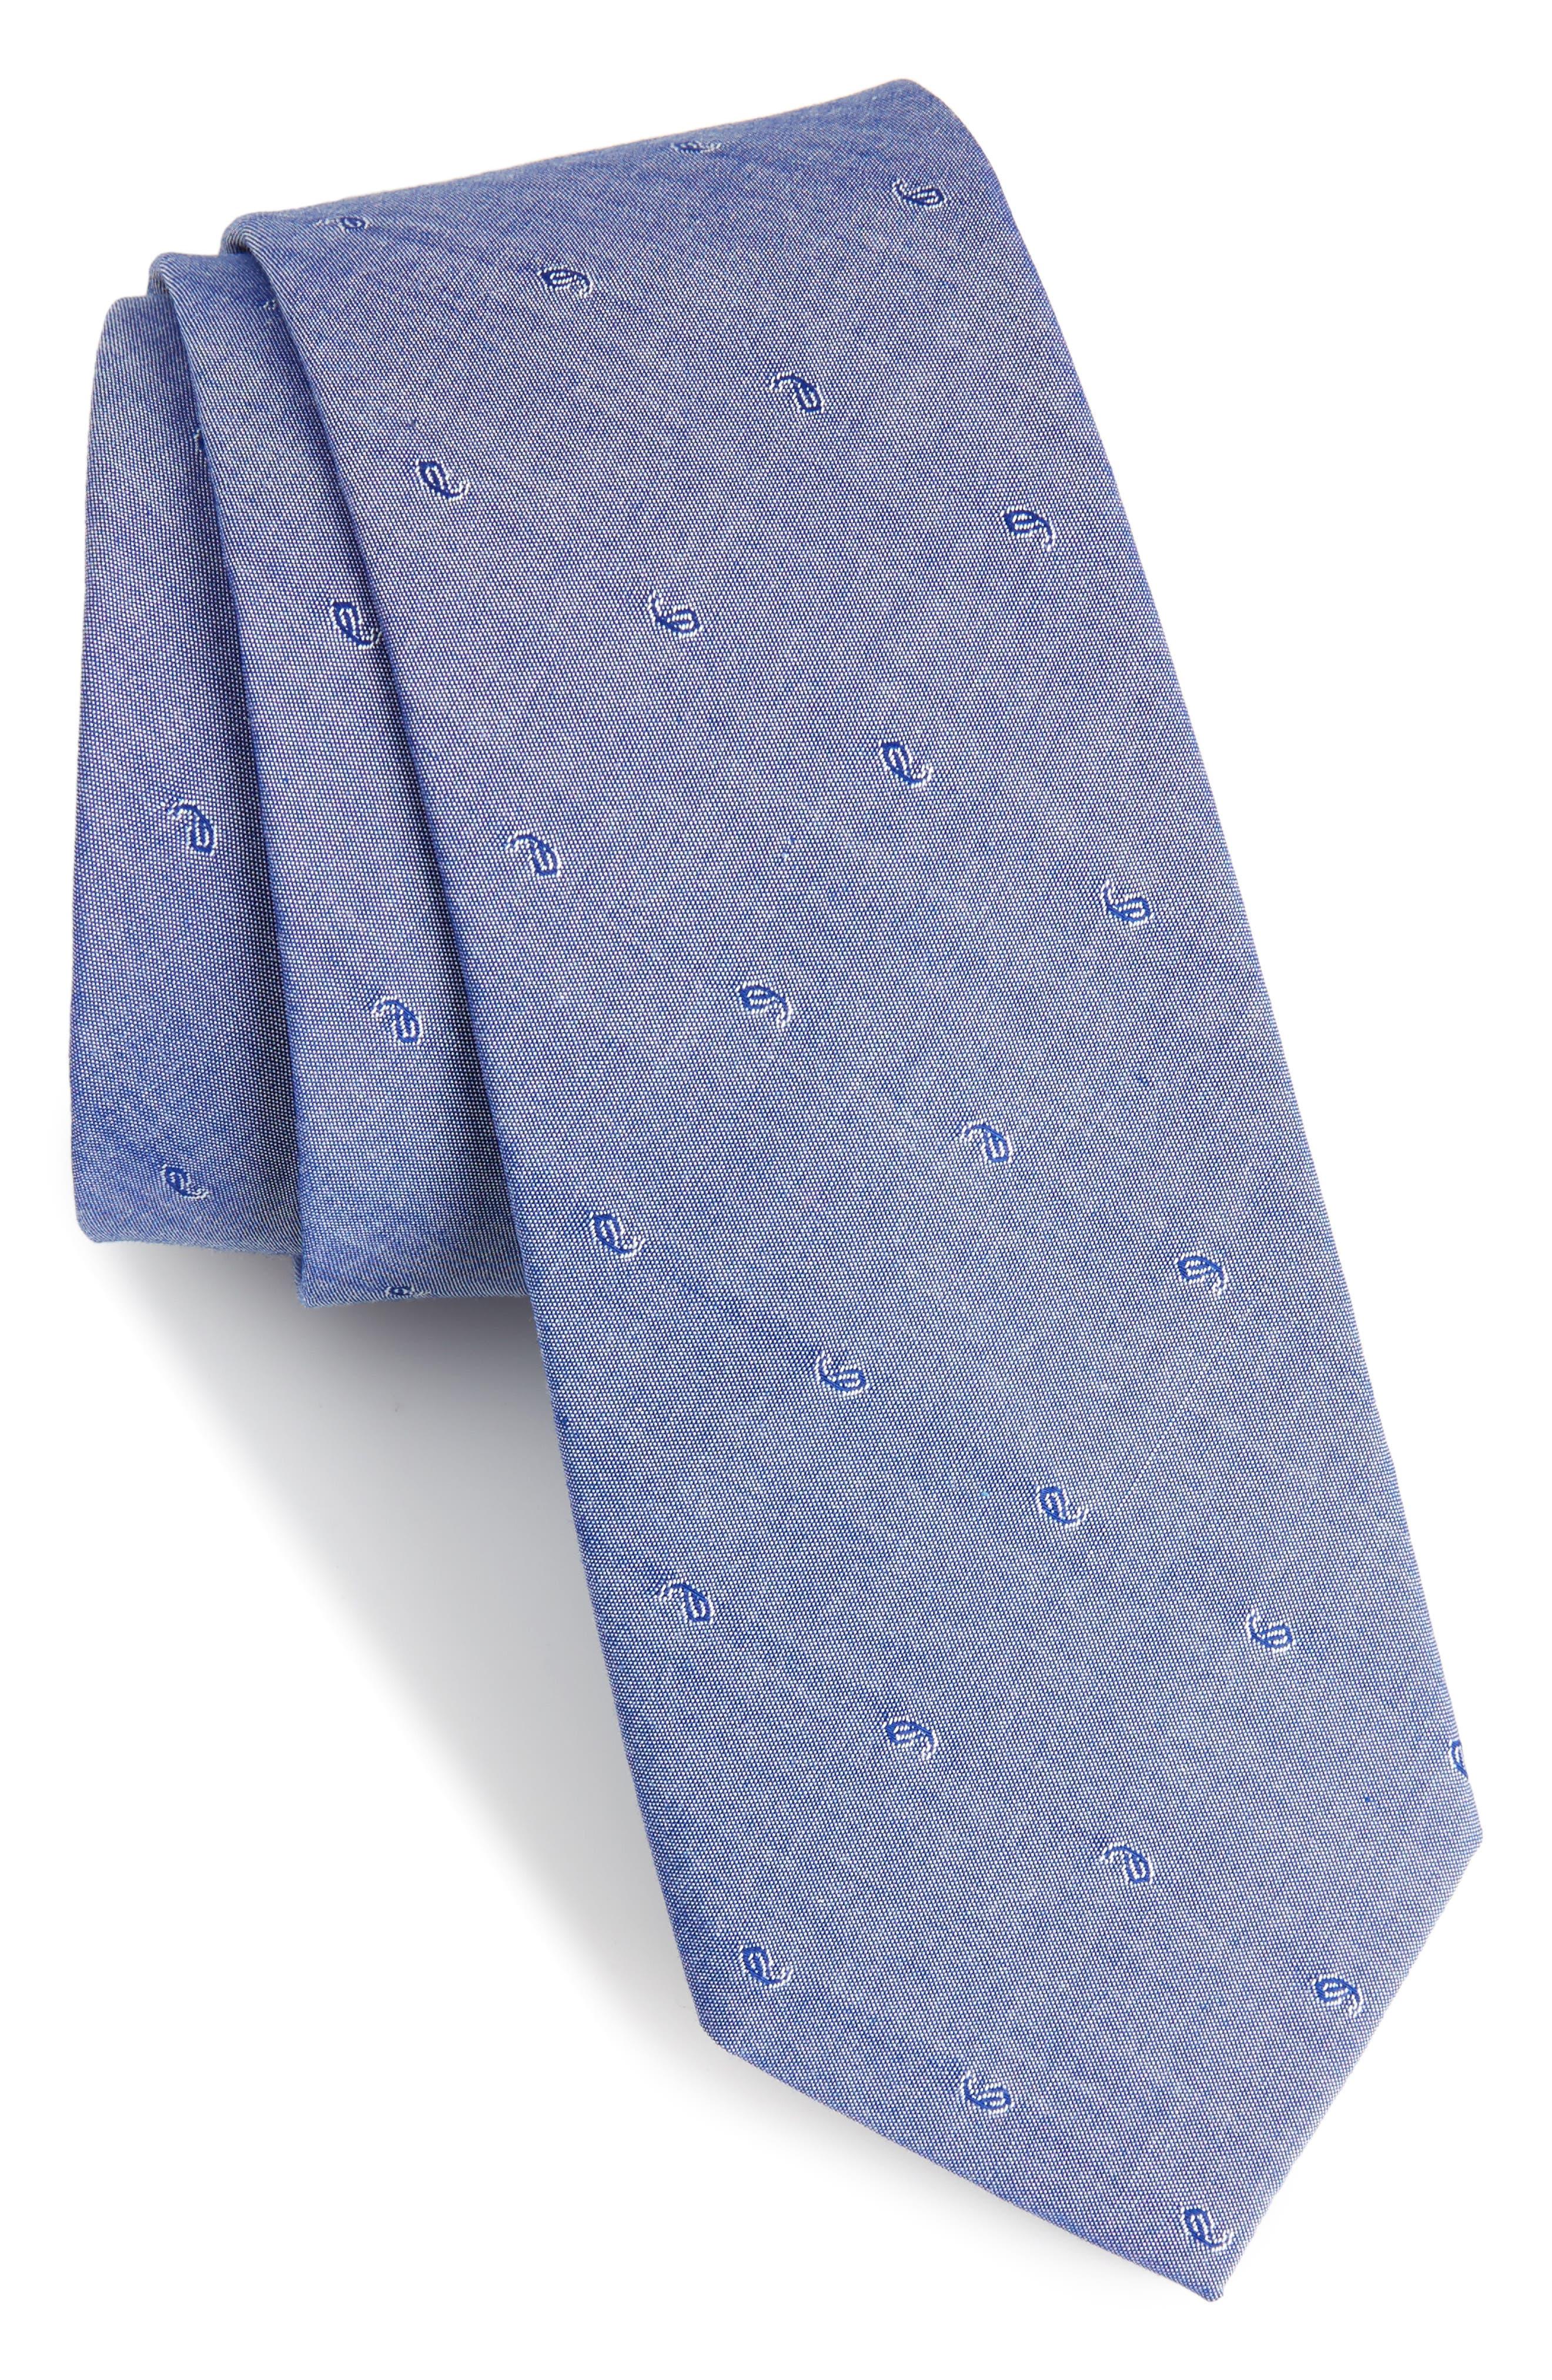 Indigo Pine Cotton Skinny Tie,                         Main,                         color, Blue